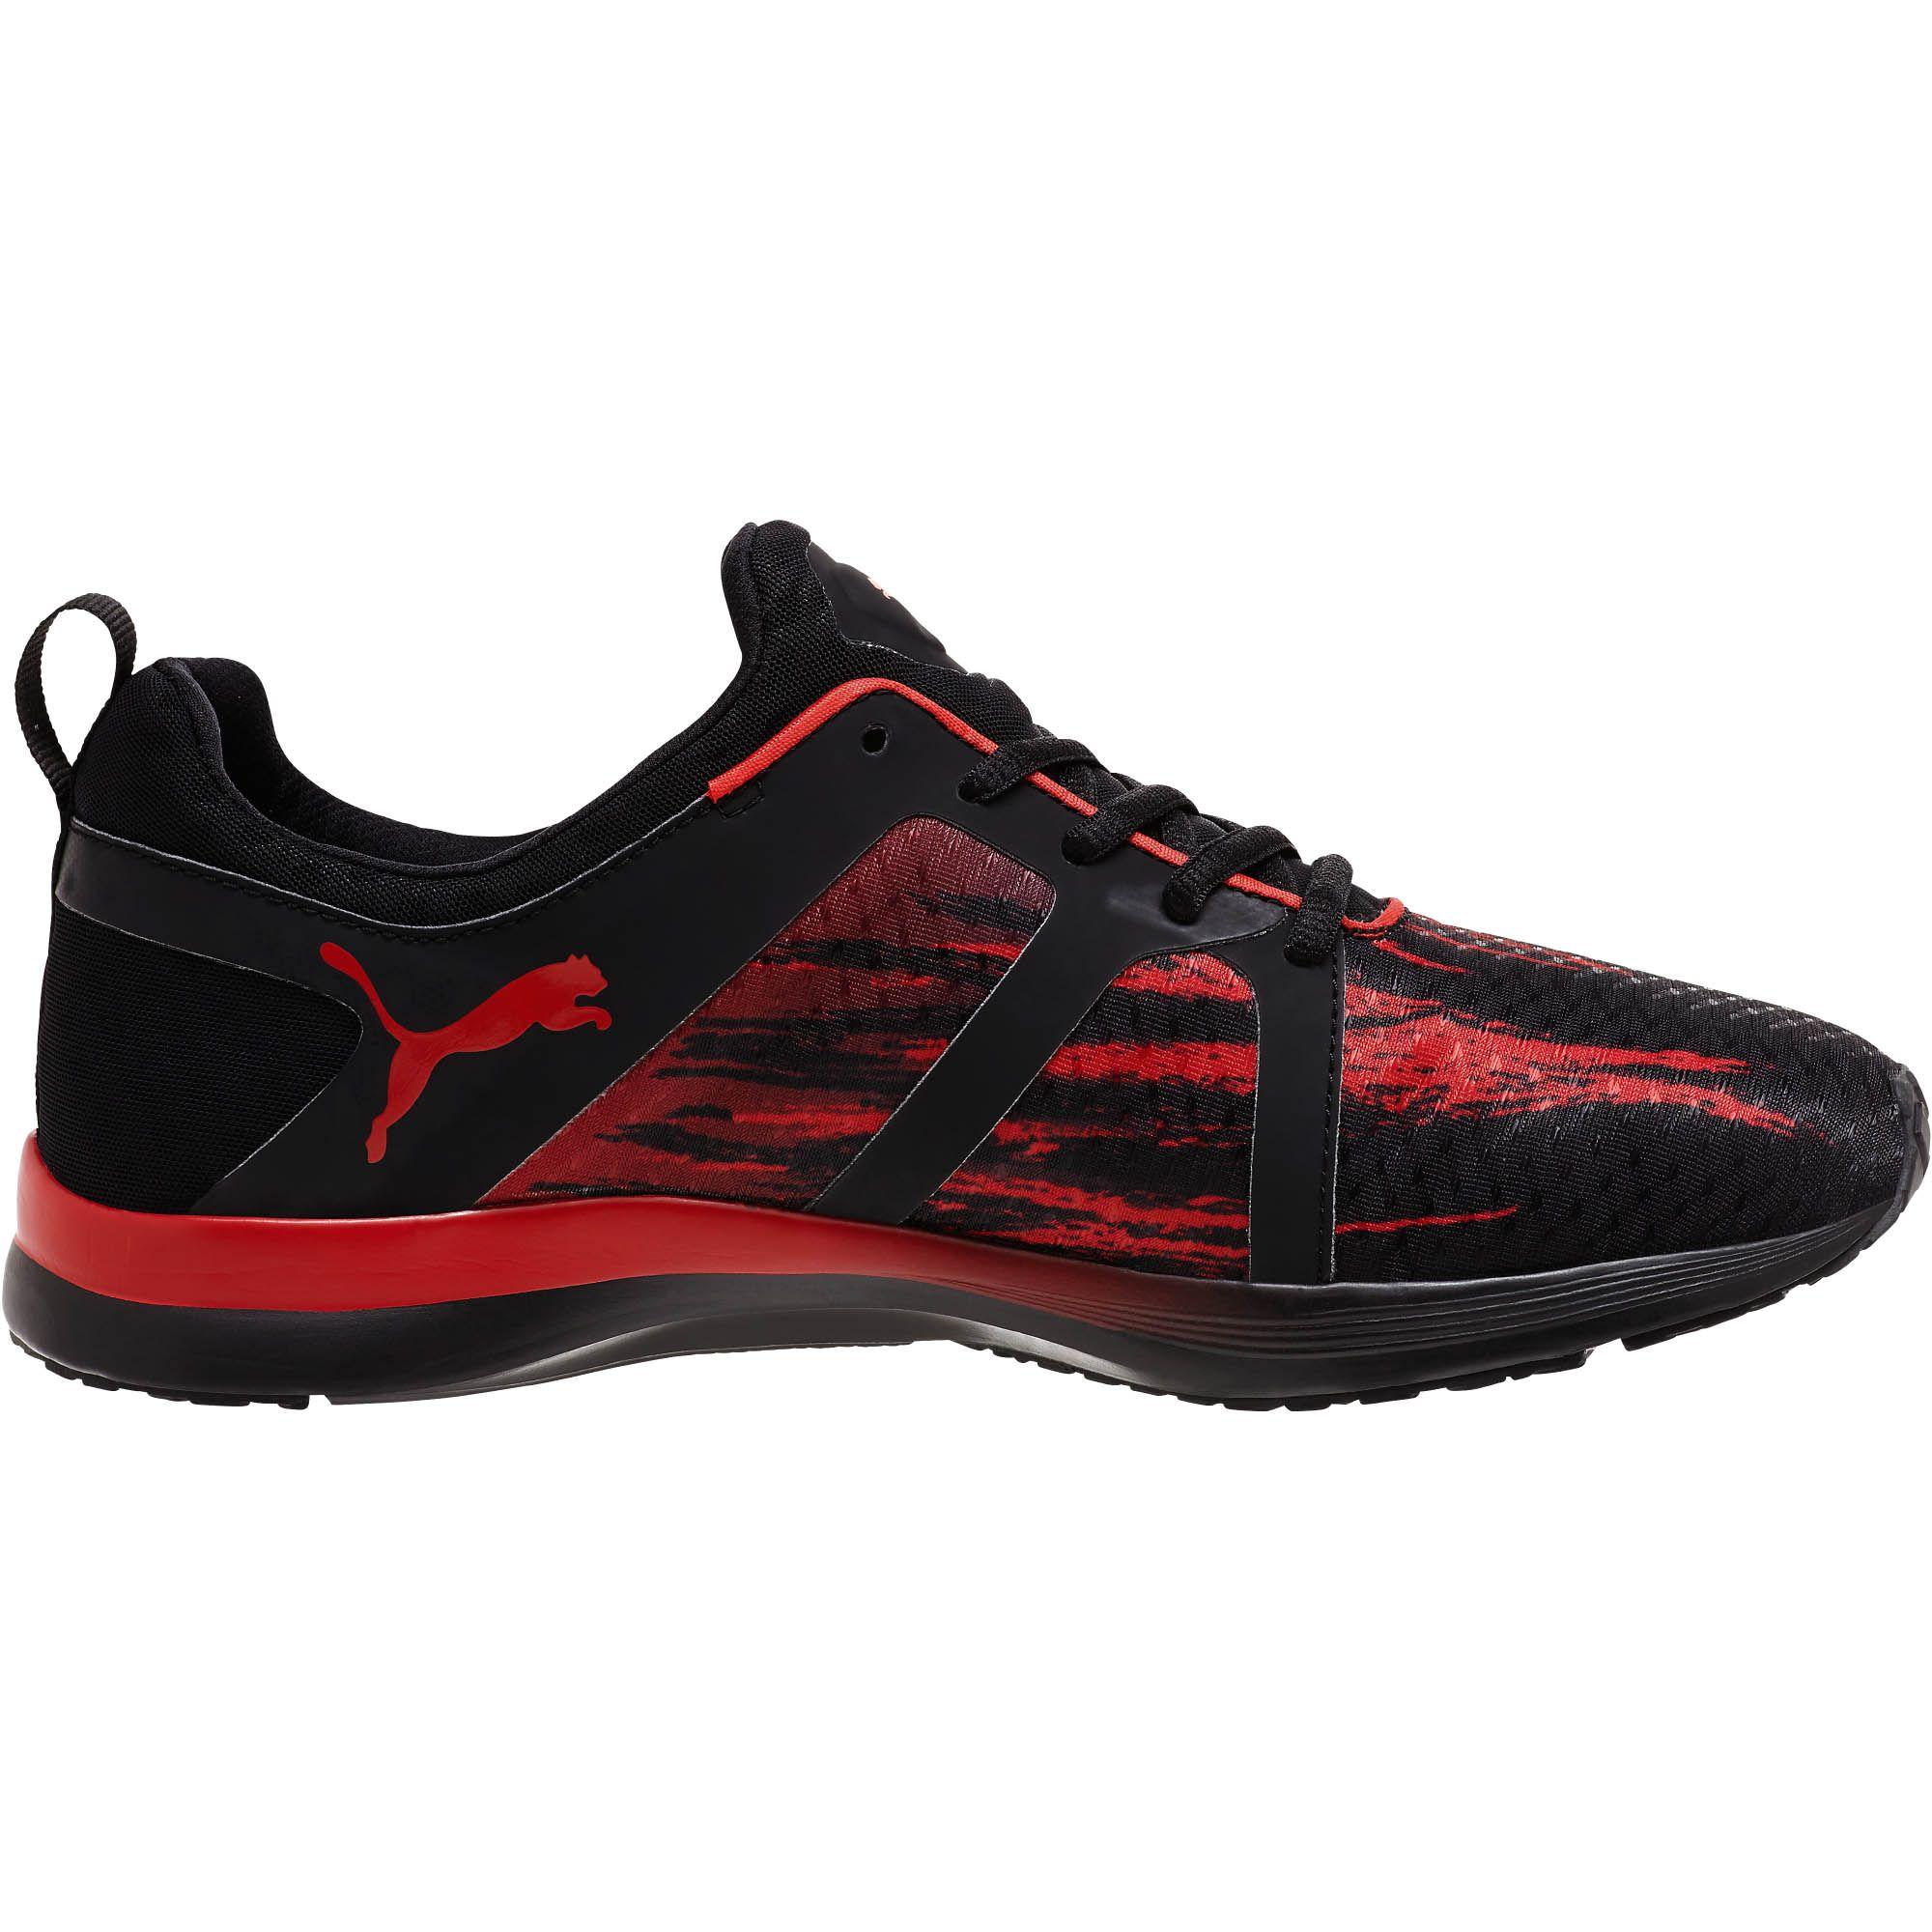 puma chaussure de fitness pulse xt fade chaussures training homme nouveau ebay. Black Bedroom Furniture Sets. Home Design Ideas